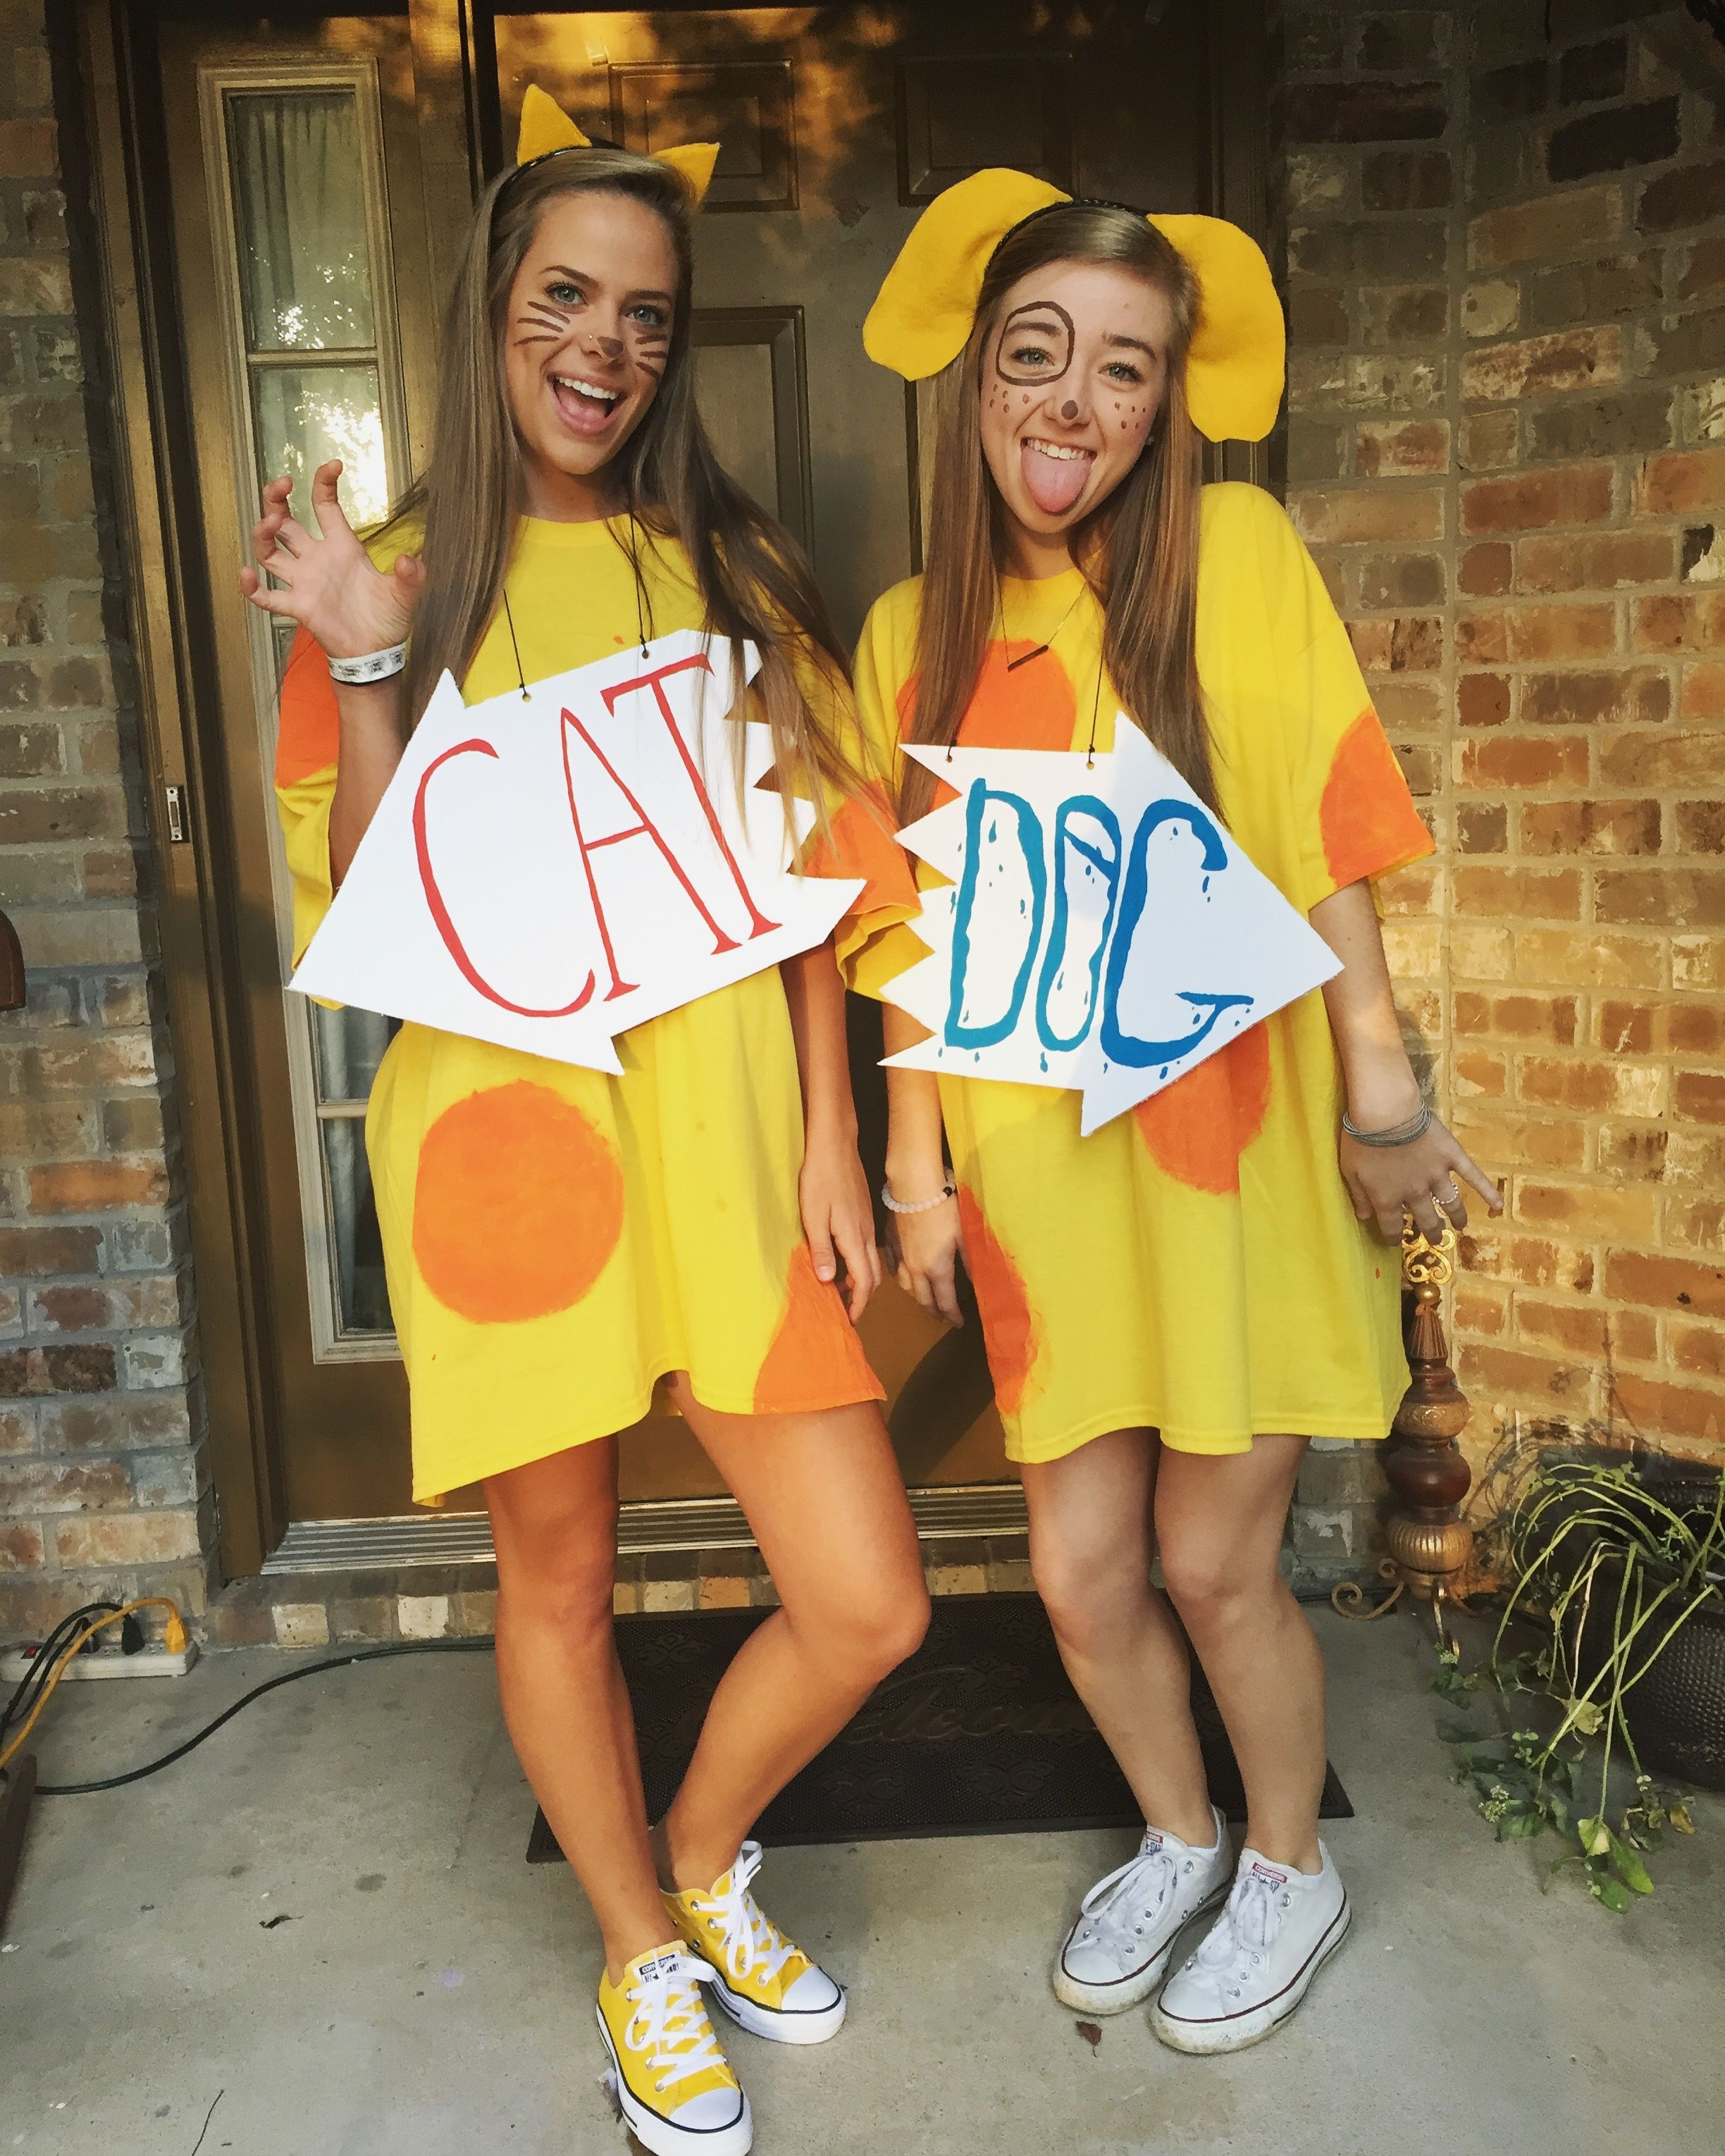 Cat Dog Costume :) | spirit week | Pinterest | Cat dog ...